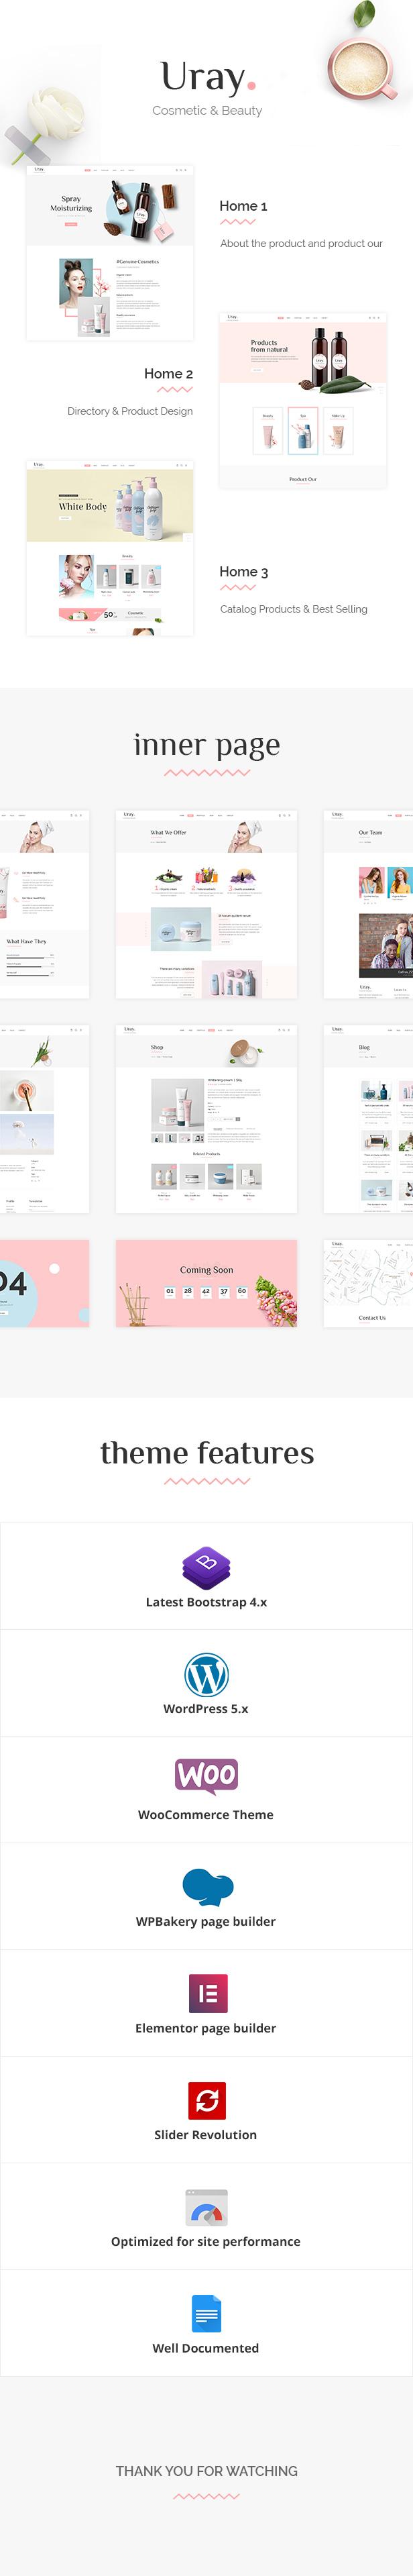 Uray - Kosmetik & Schönheitssalon WordPress WooCommerce Theme - 1